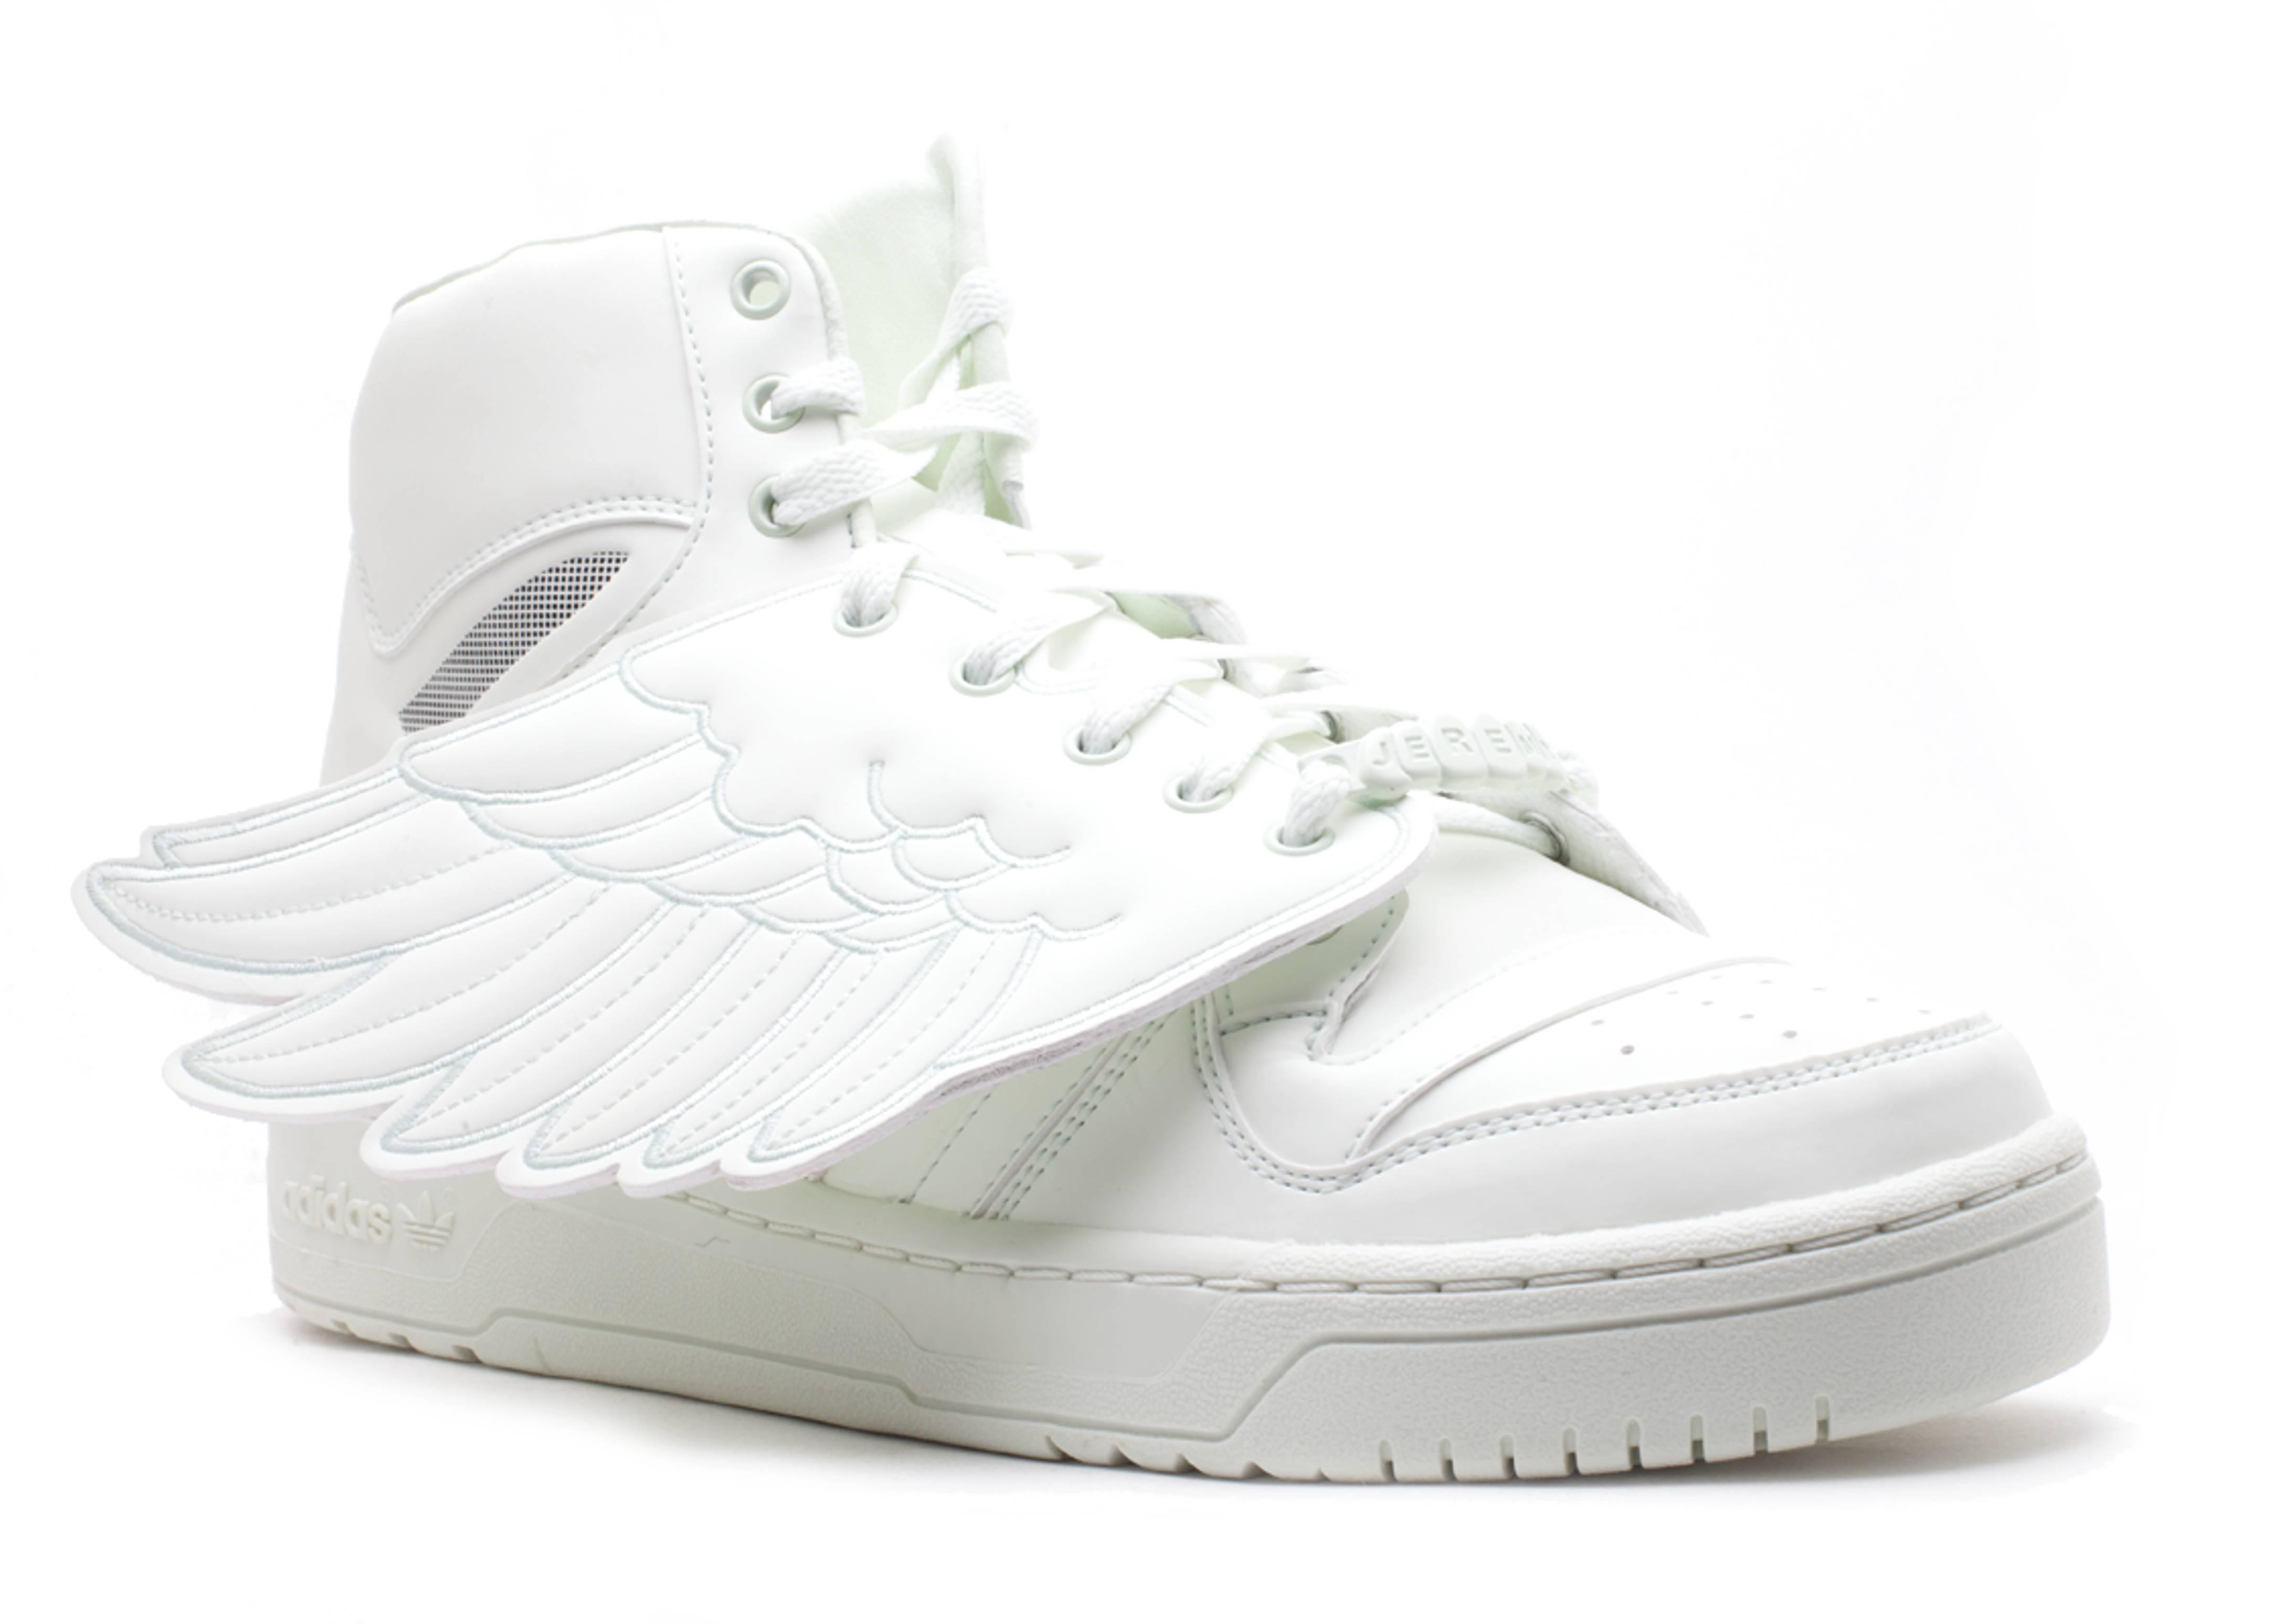 sports shoes f67d4 daf1c adidas js wings glow in the dark x jeremy scott release